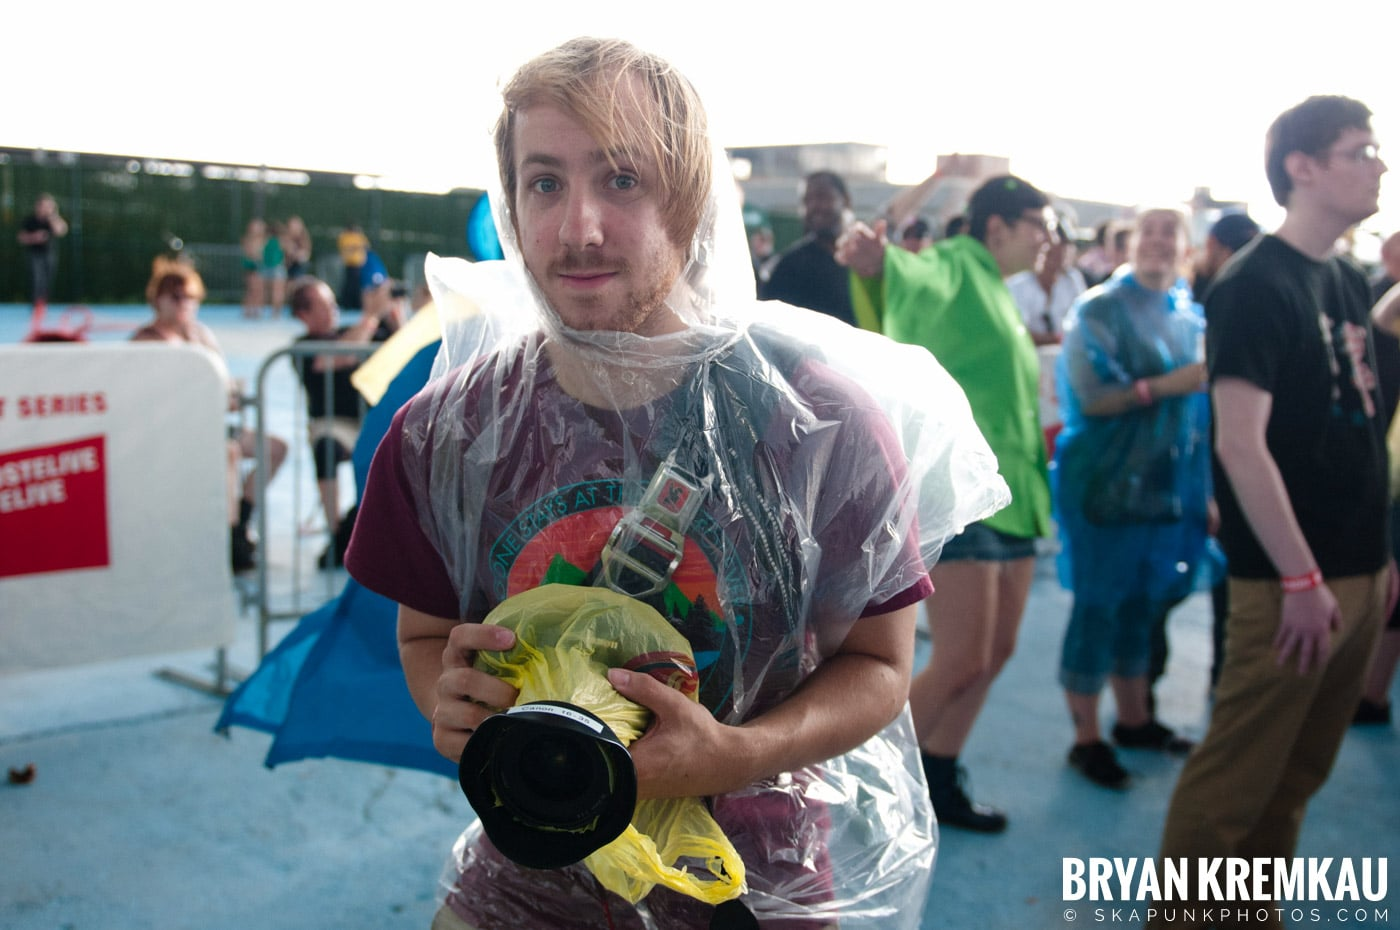 The Bronx @ Riot Fest 2012, Williamsburg Park NY - 9.8.12 (4)